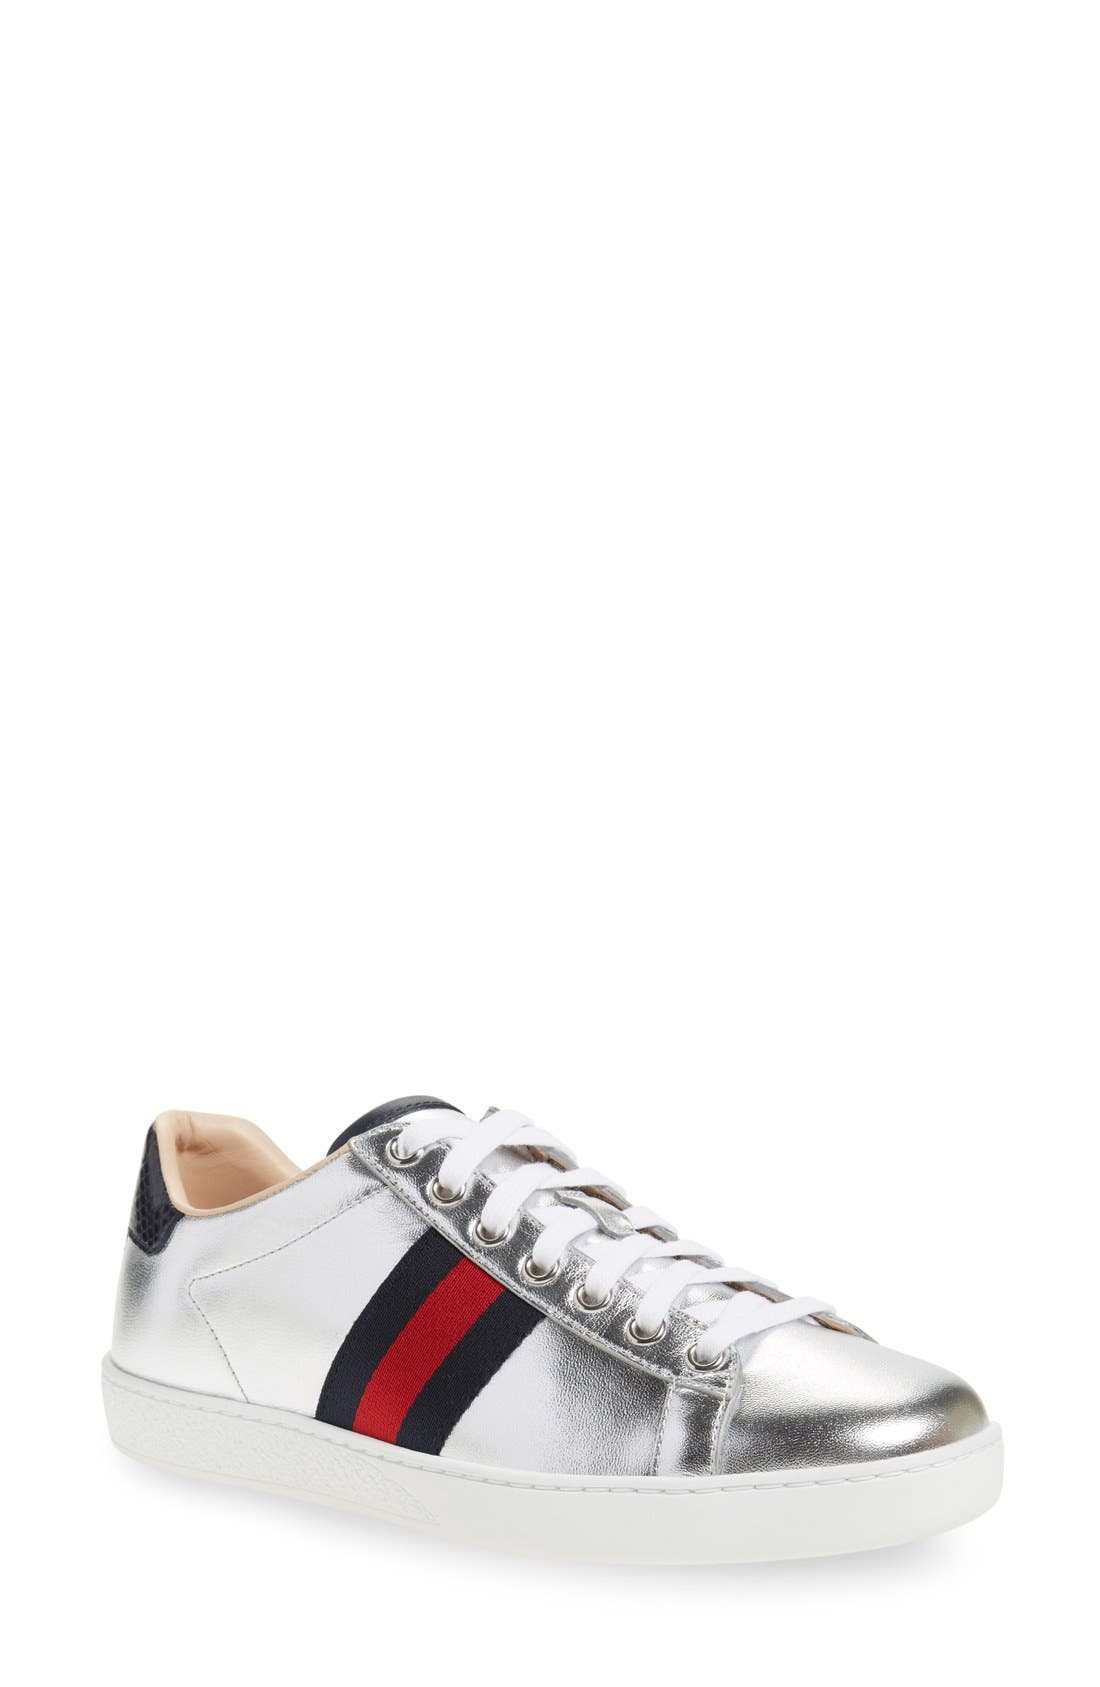 'New Ace' Metallic Low Top Sneaker, Main, color, 040